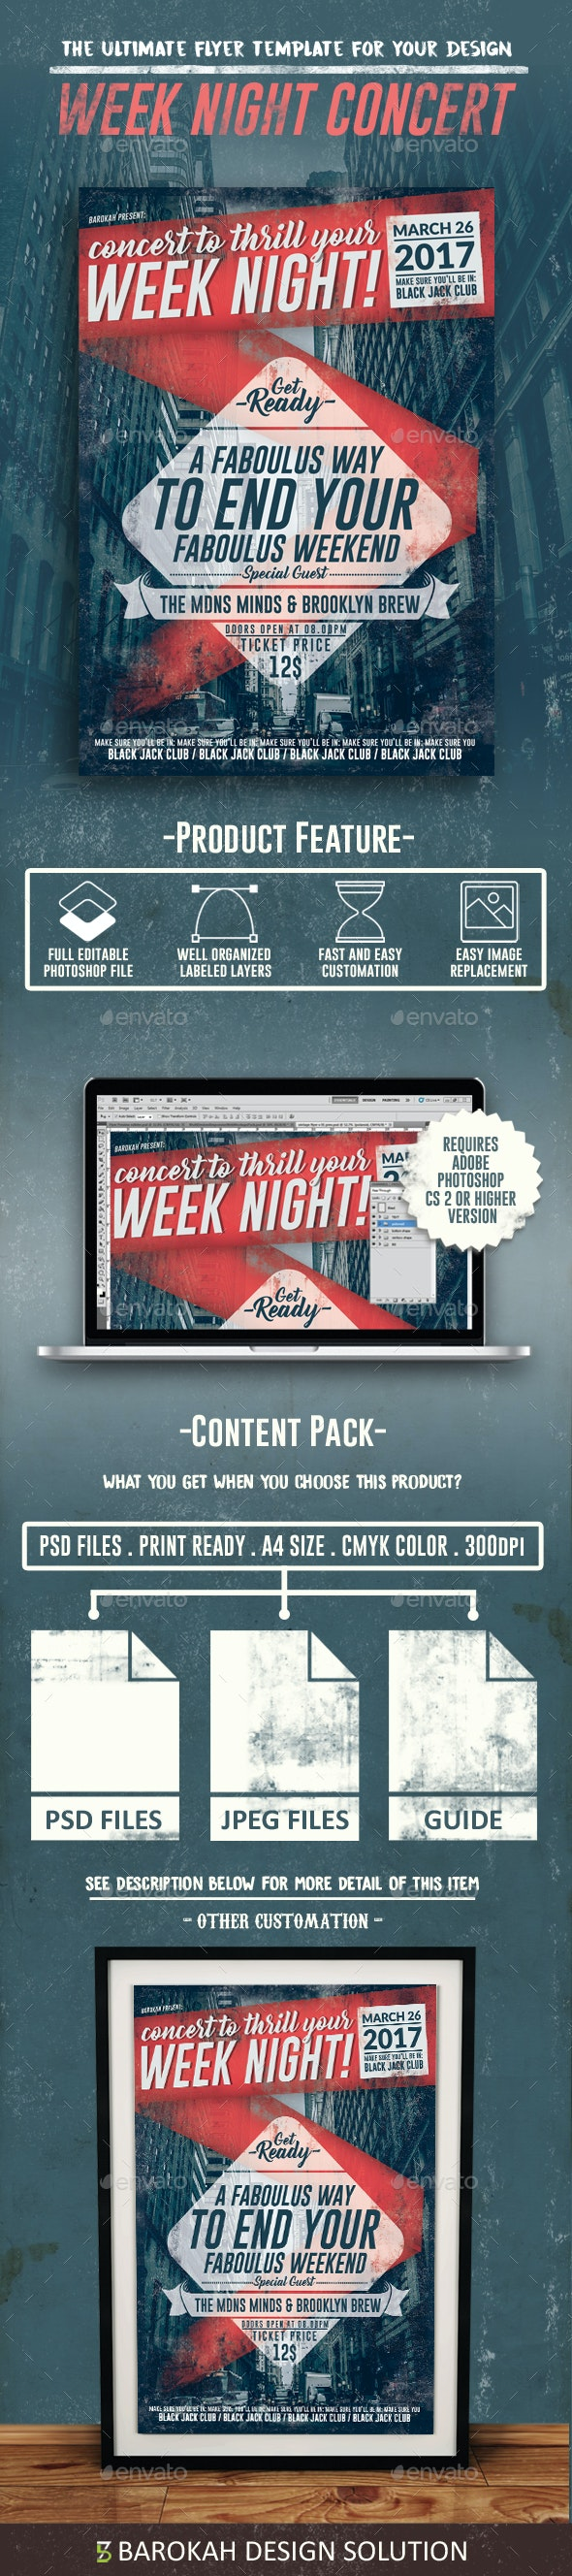 Retro Week Night Concert Flyer - Flyers Print Templates